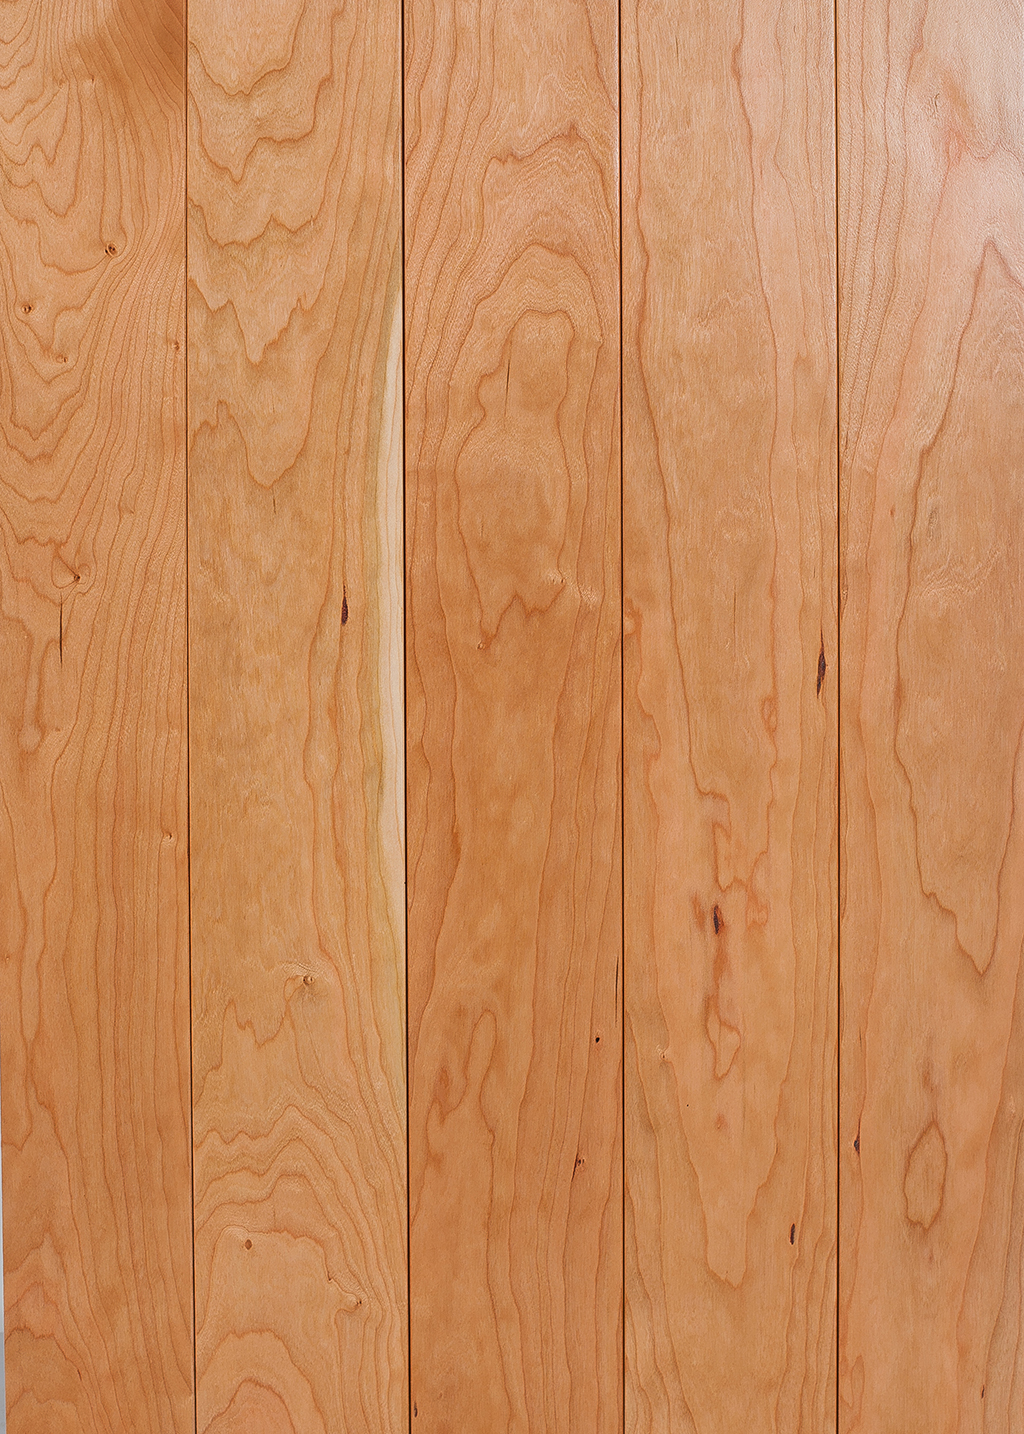 sample piece of cherry wood